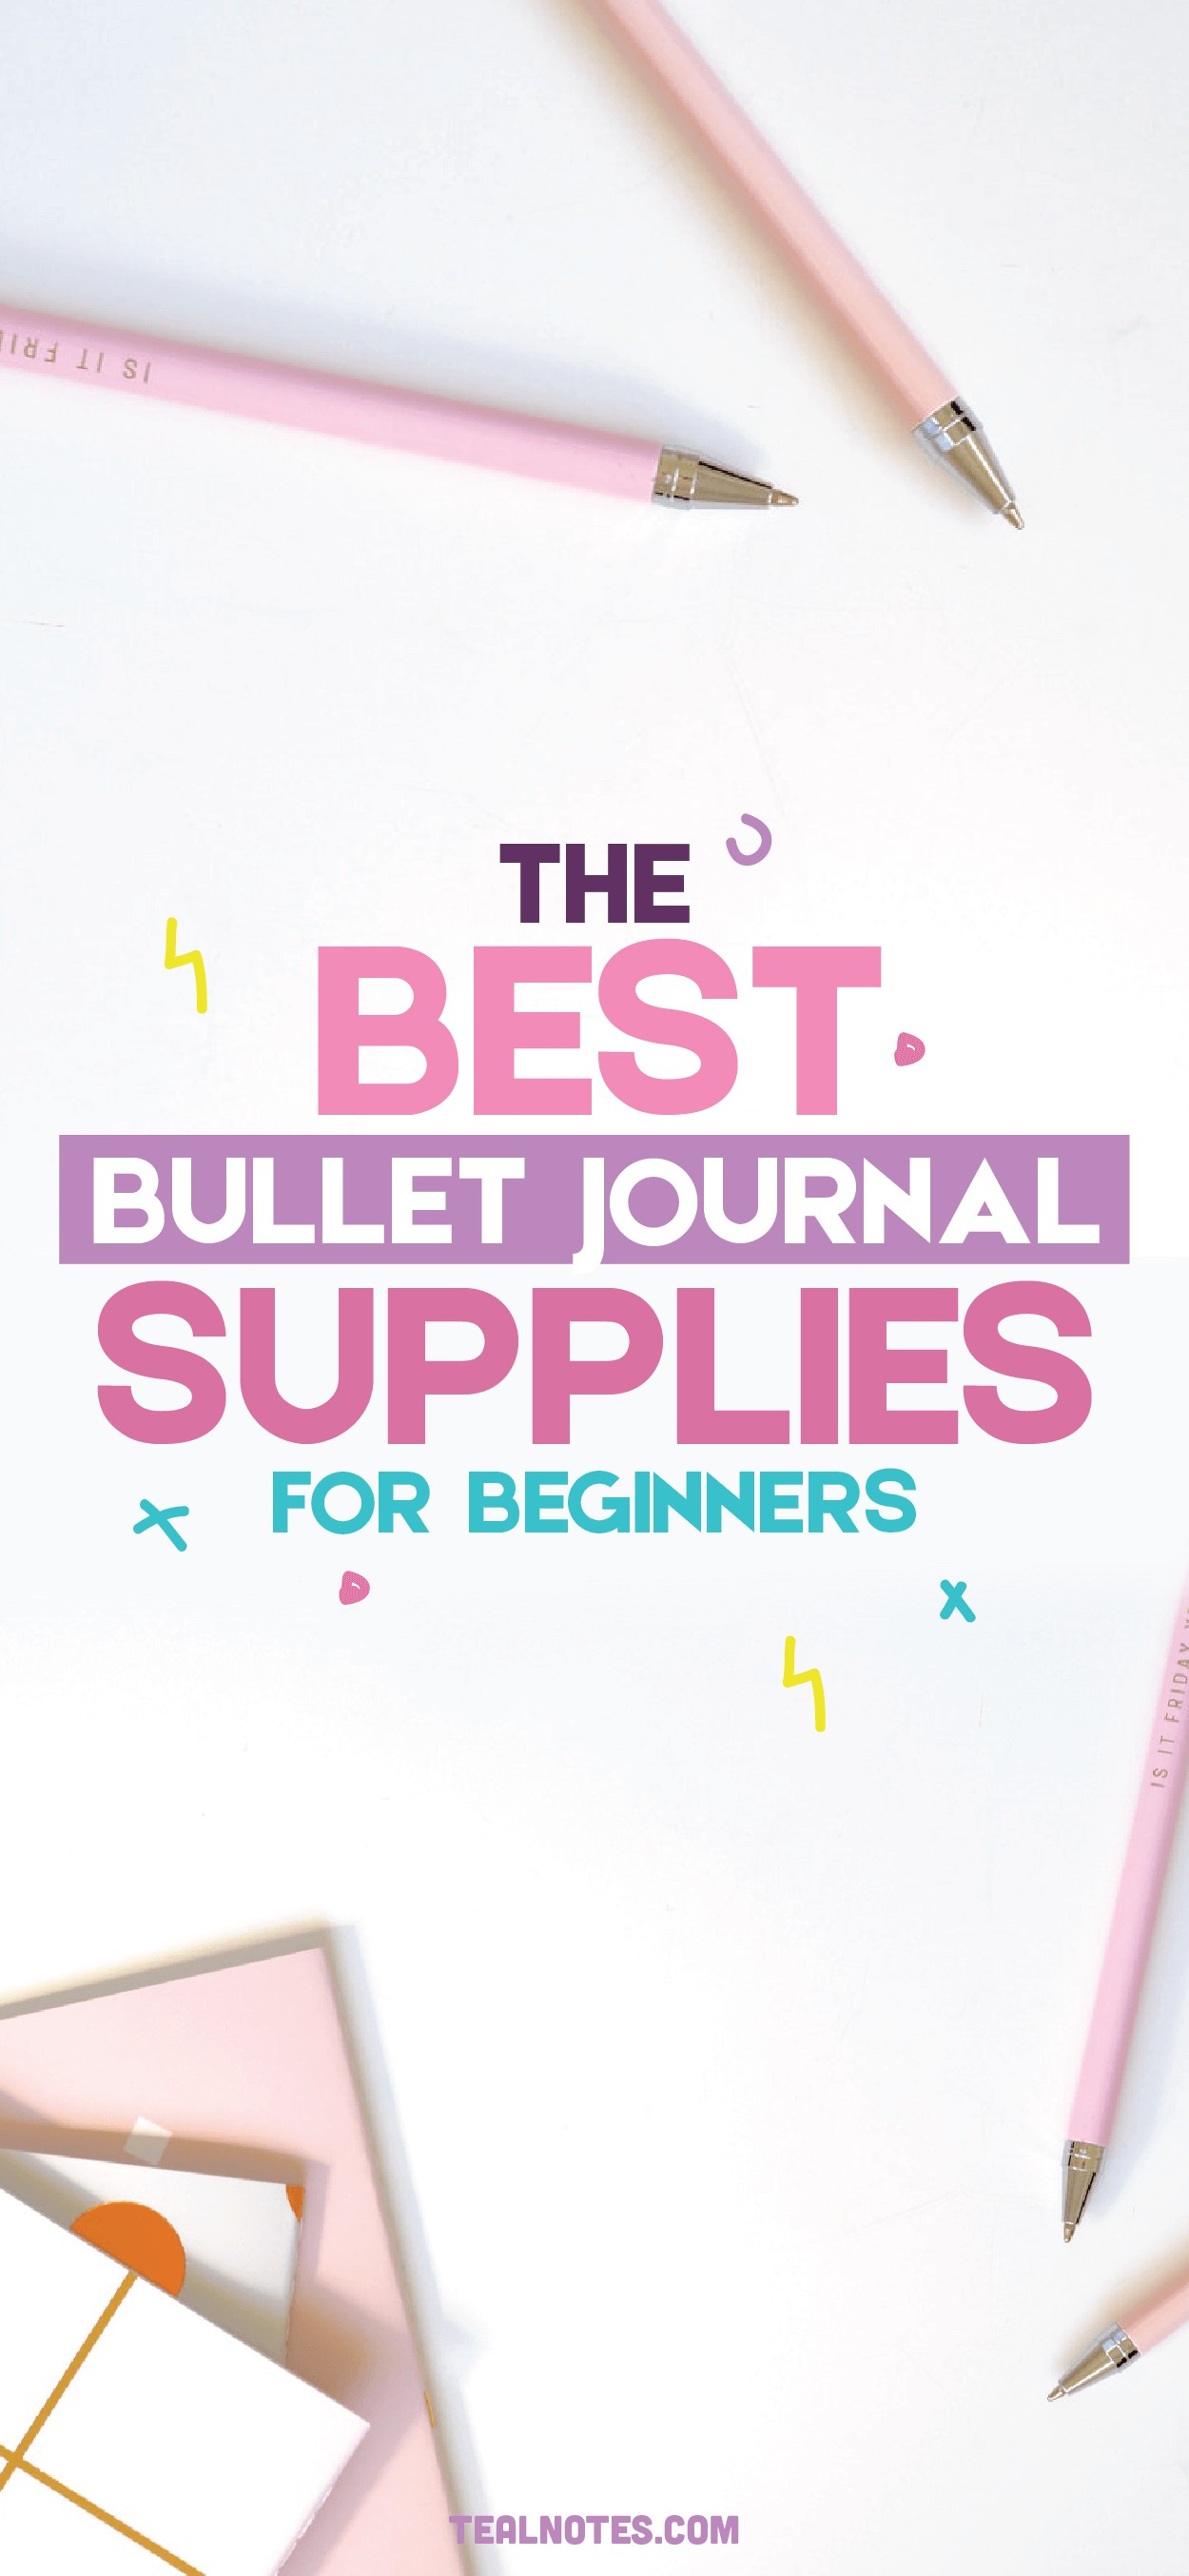 best bullet journal supplies for beginners, the best bullet journal notebook and pens